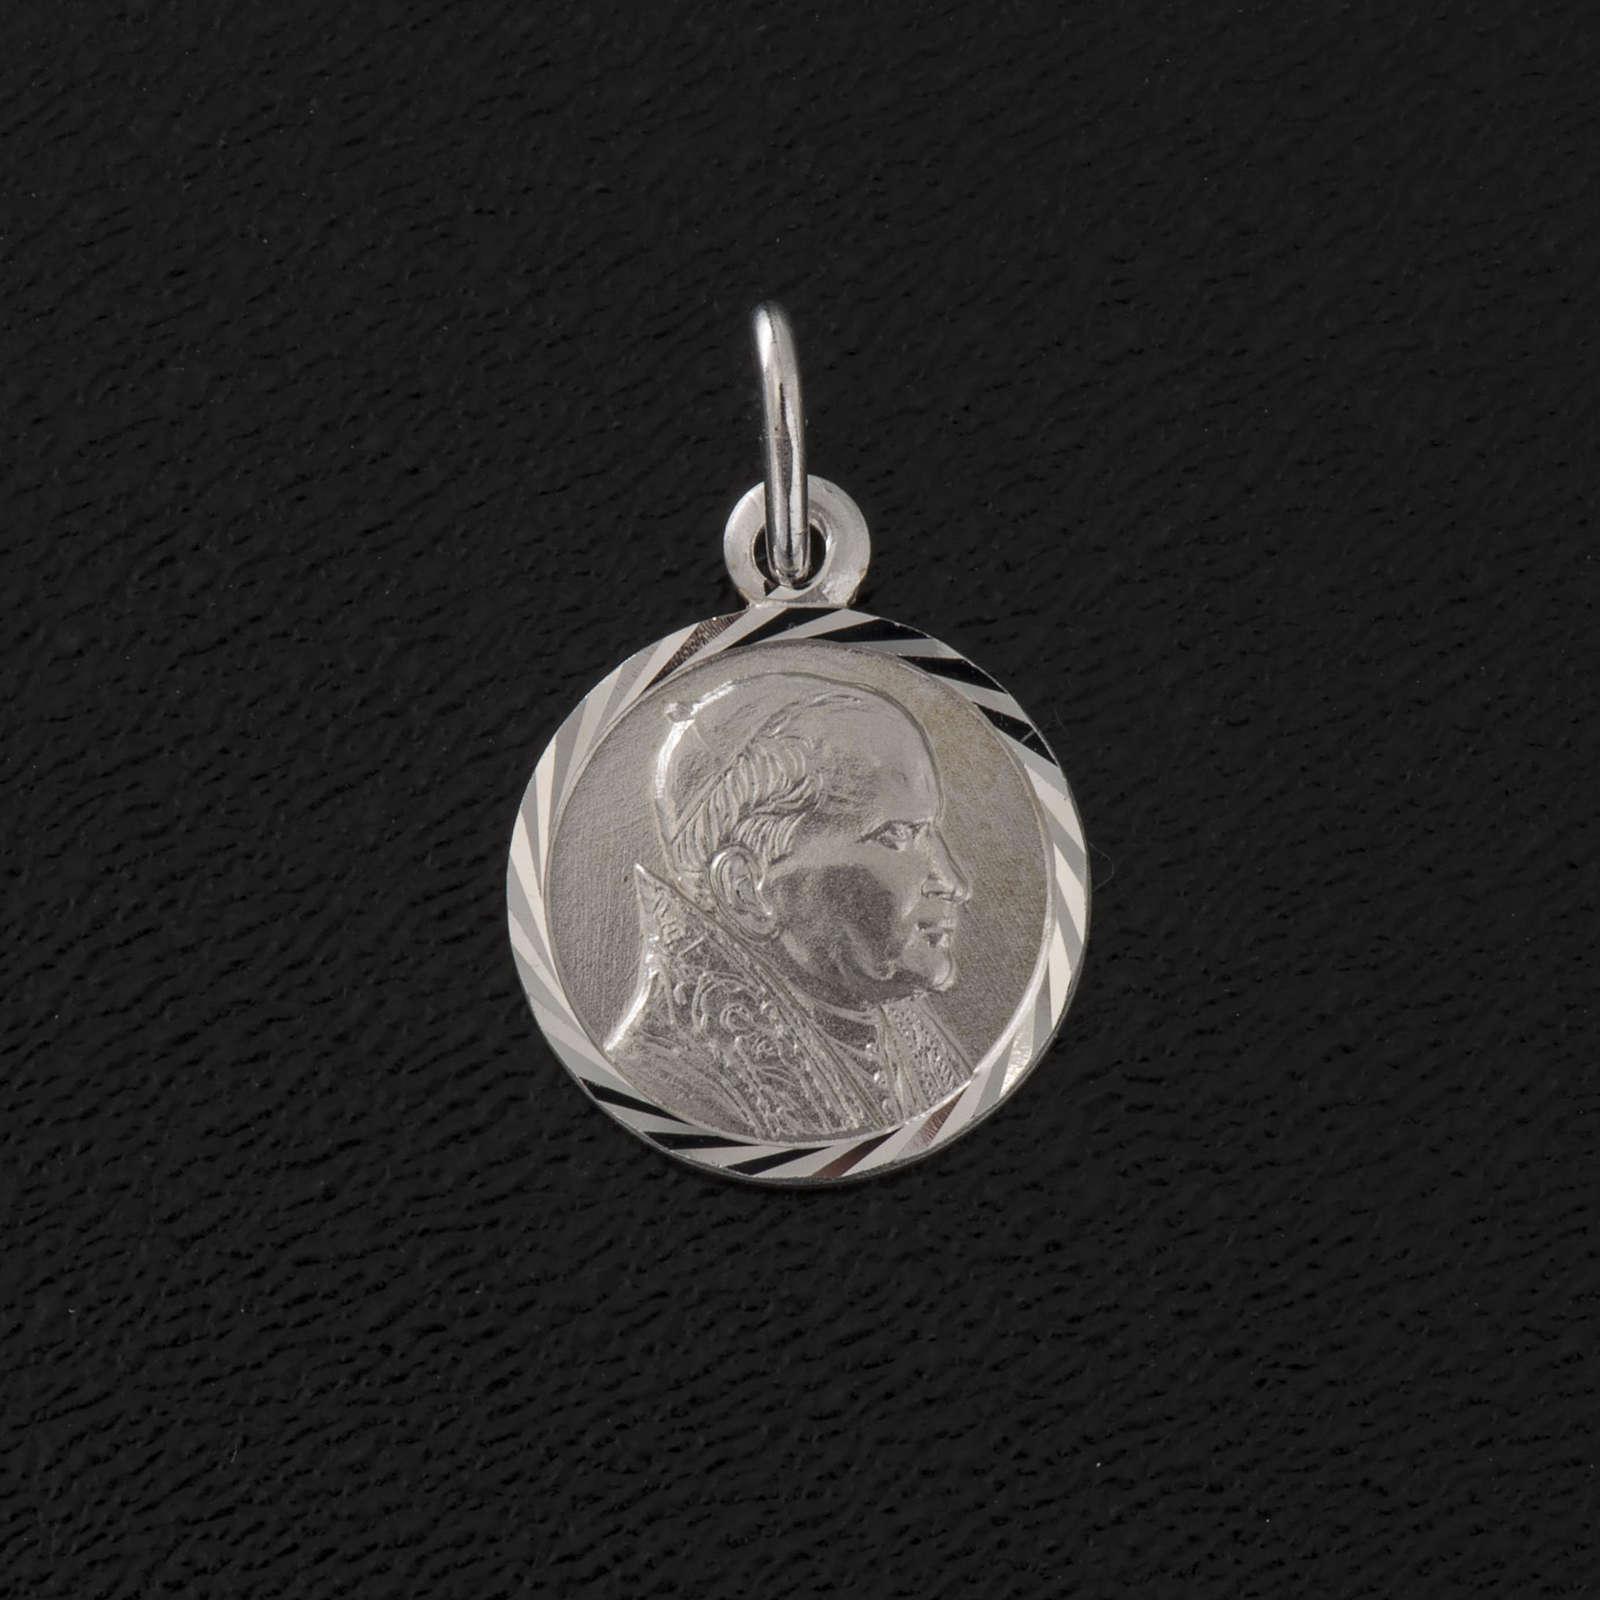 Médaille Jean Paul II argent 925 diam. 1 cm 4